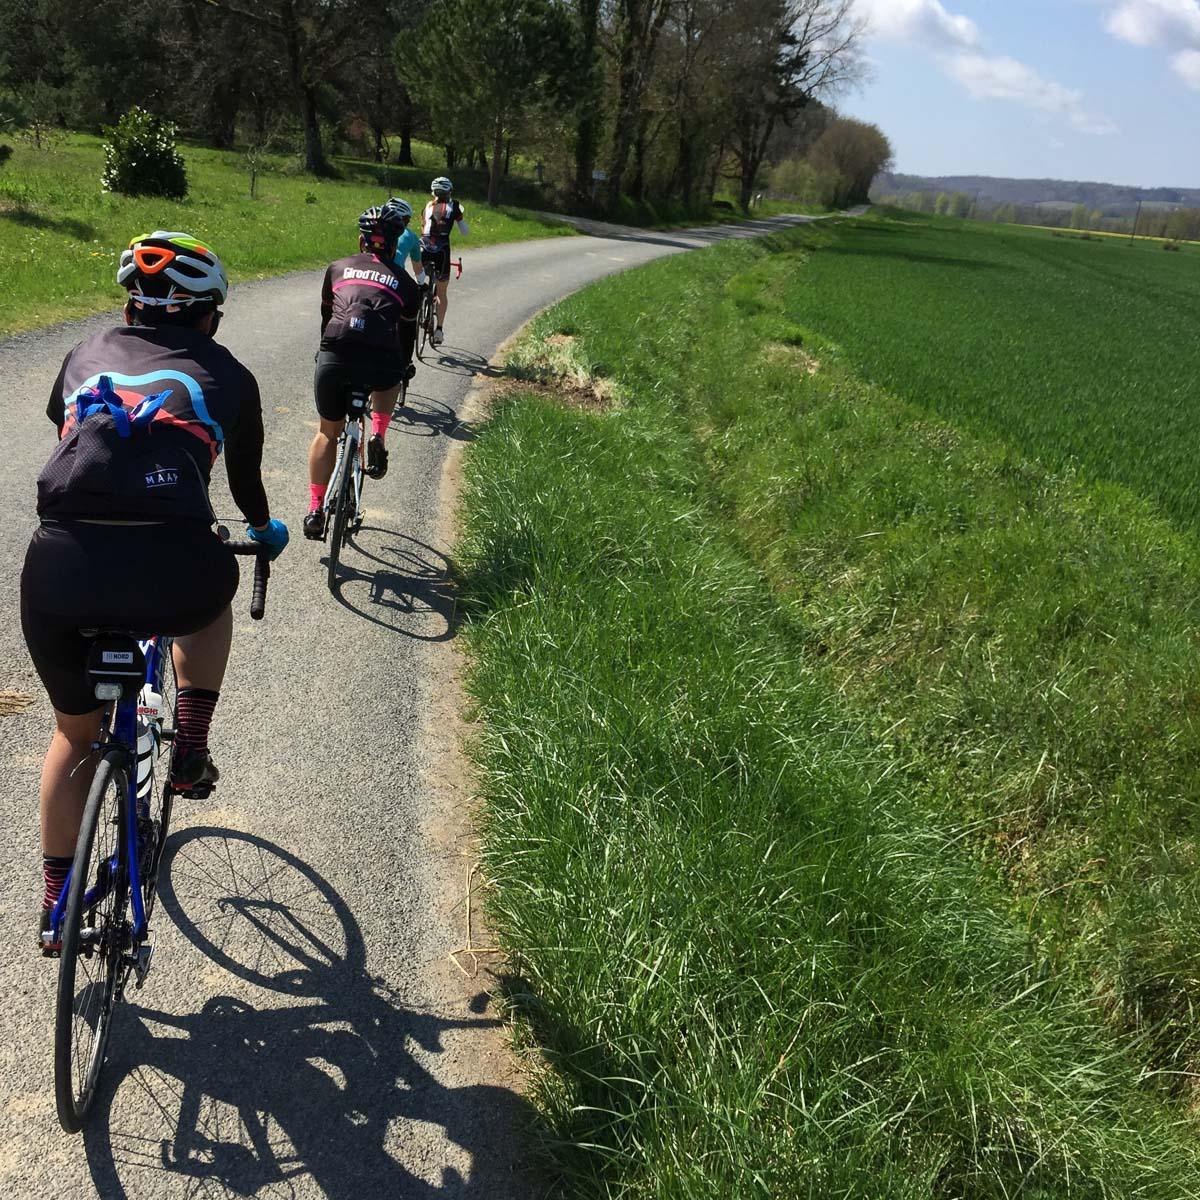 Groups exploring the regions roads